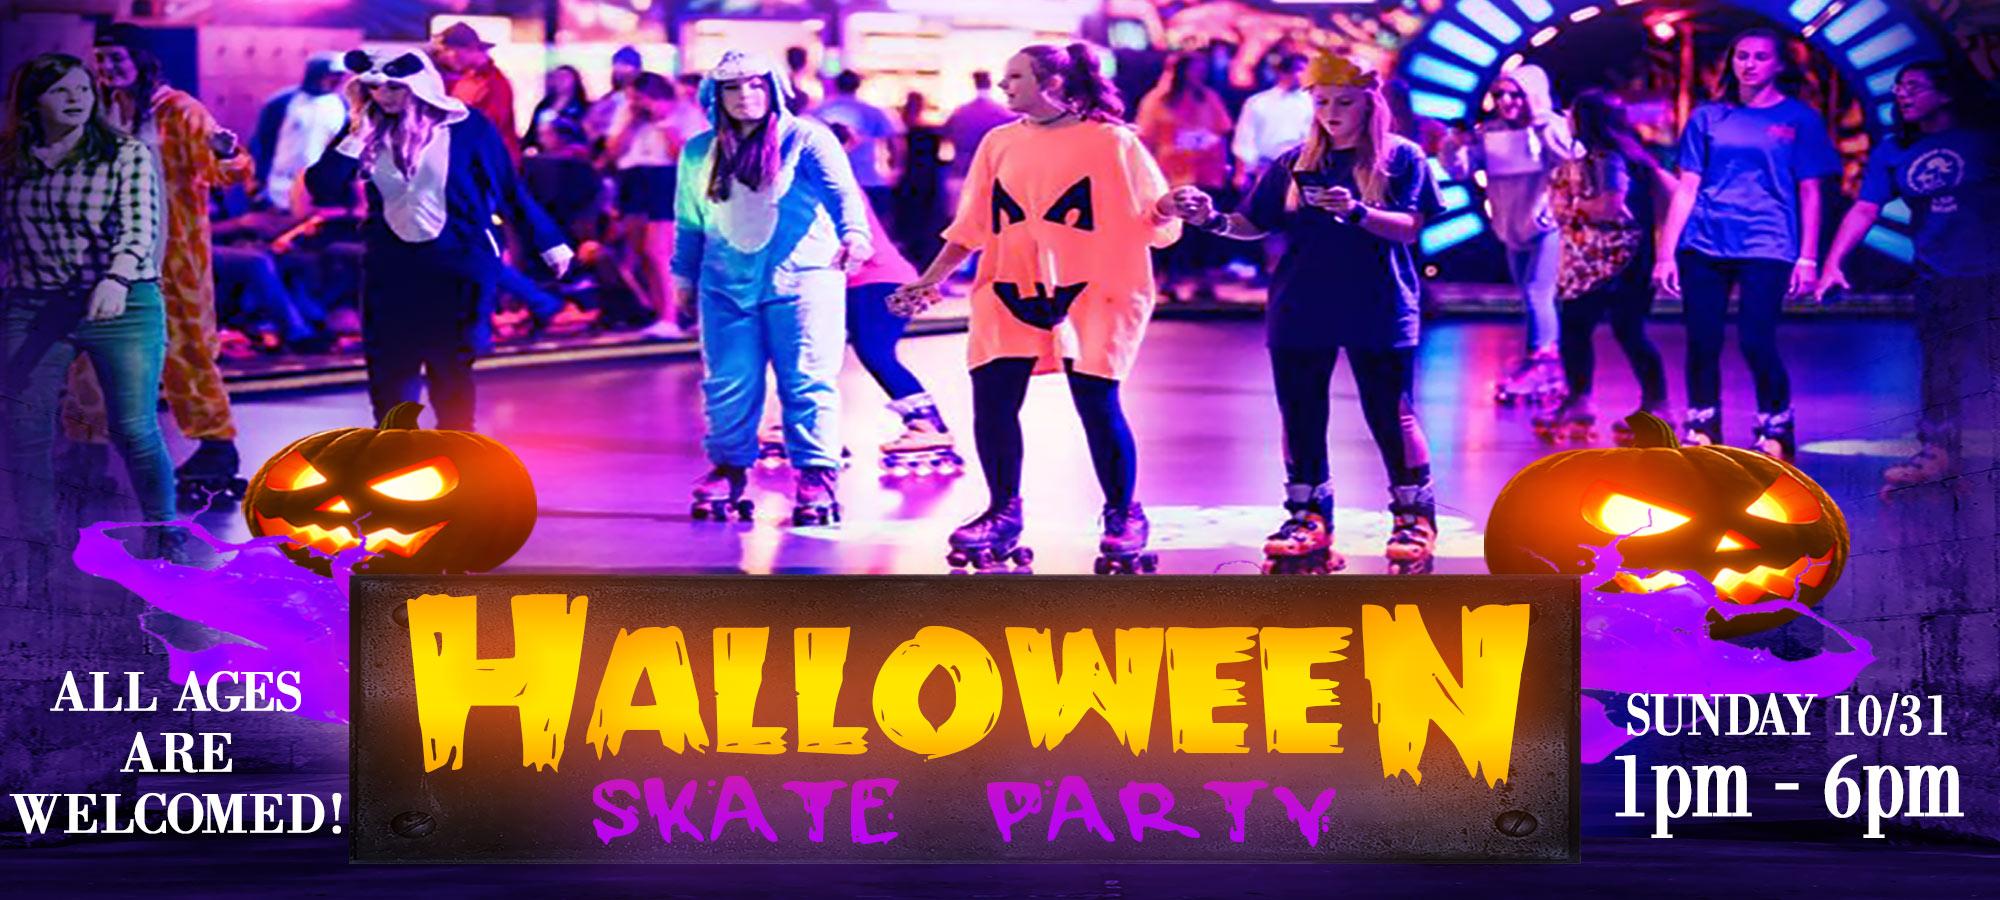 Halloween-Skate-Night-2021